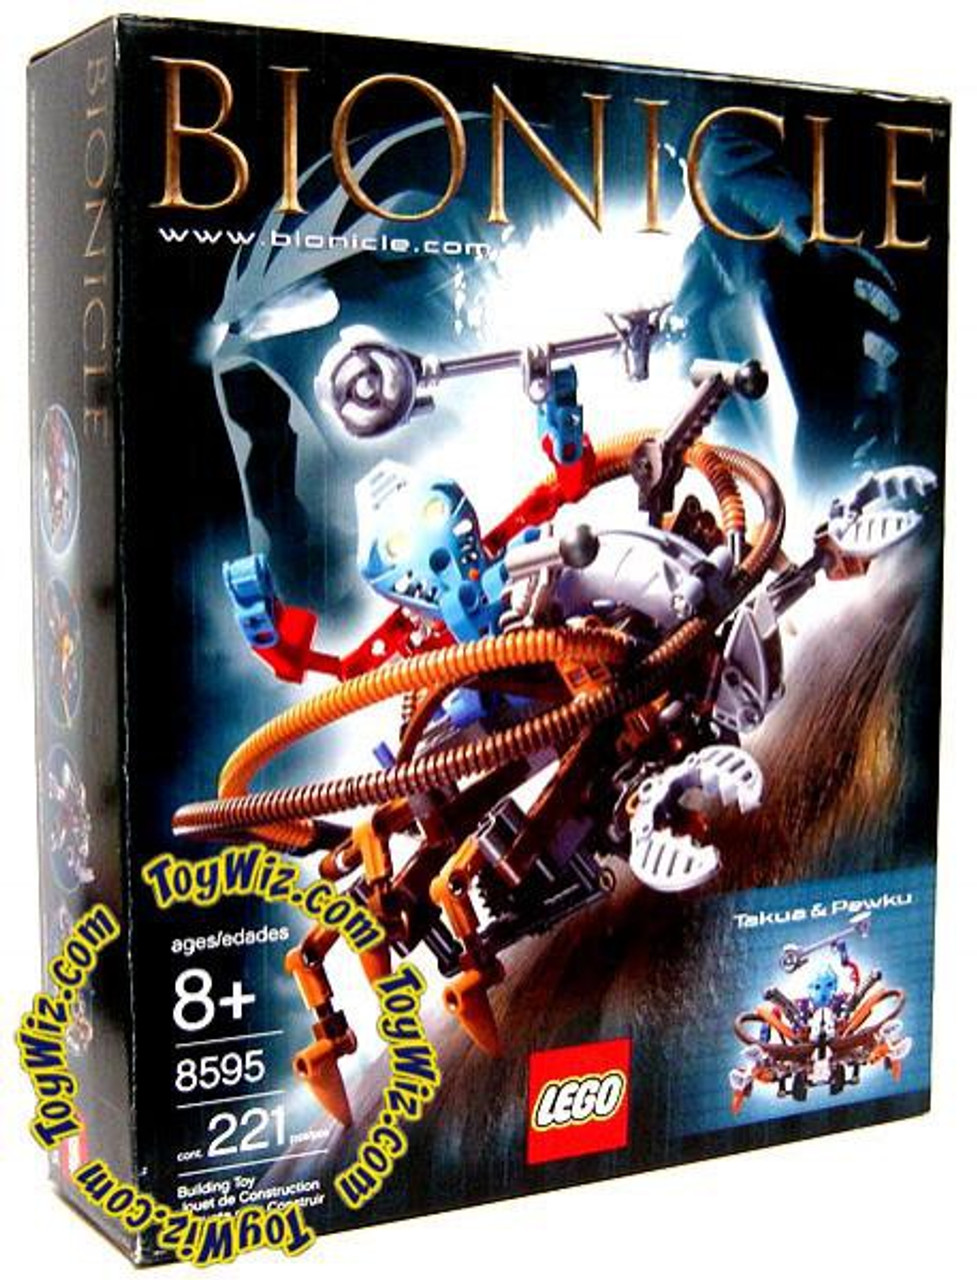 LEGO Bionicle Takua & Pewku Set #8595